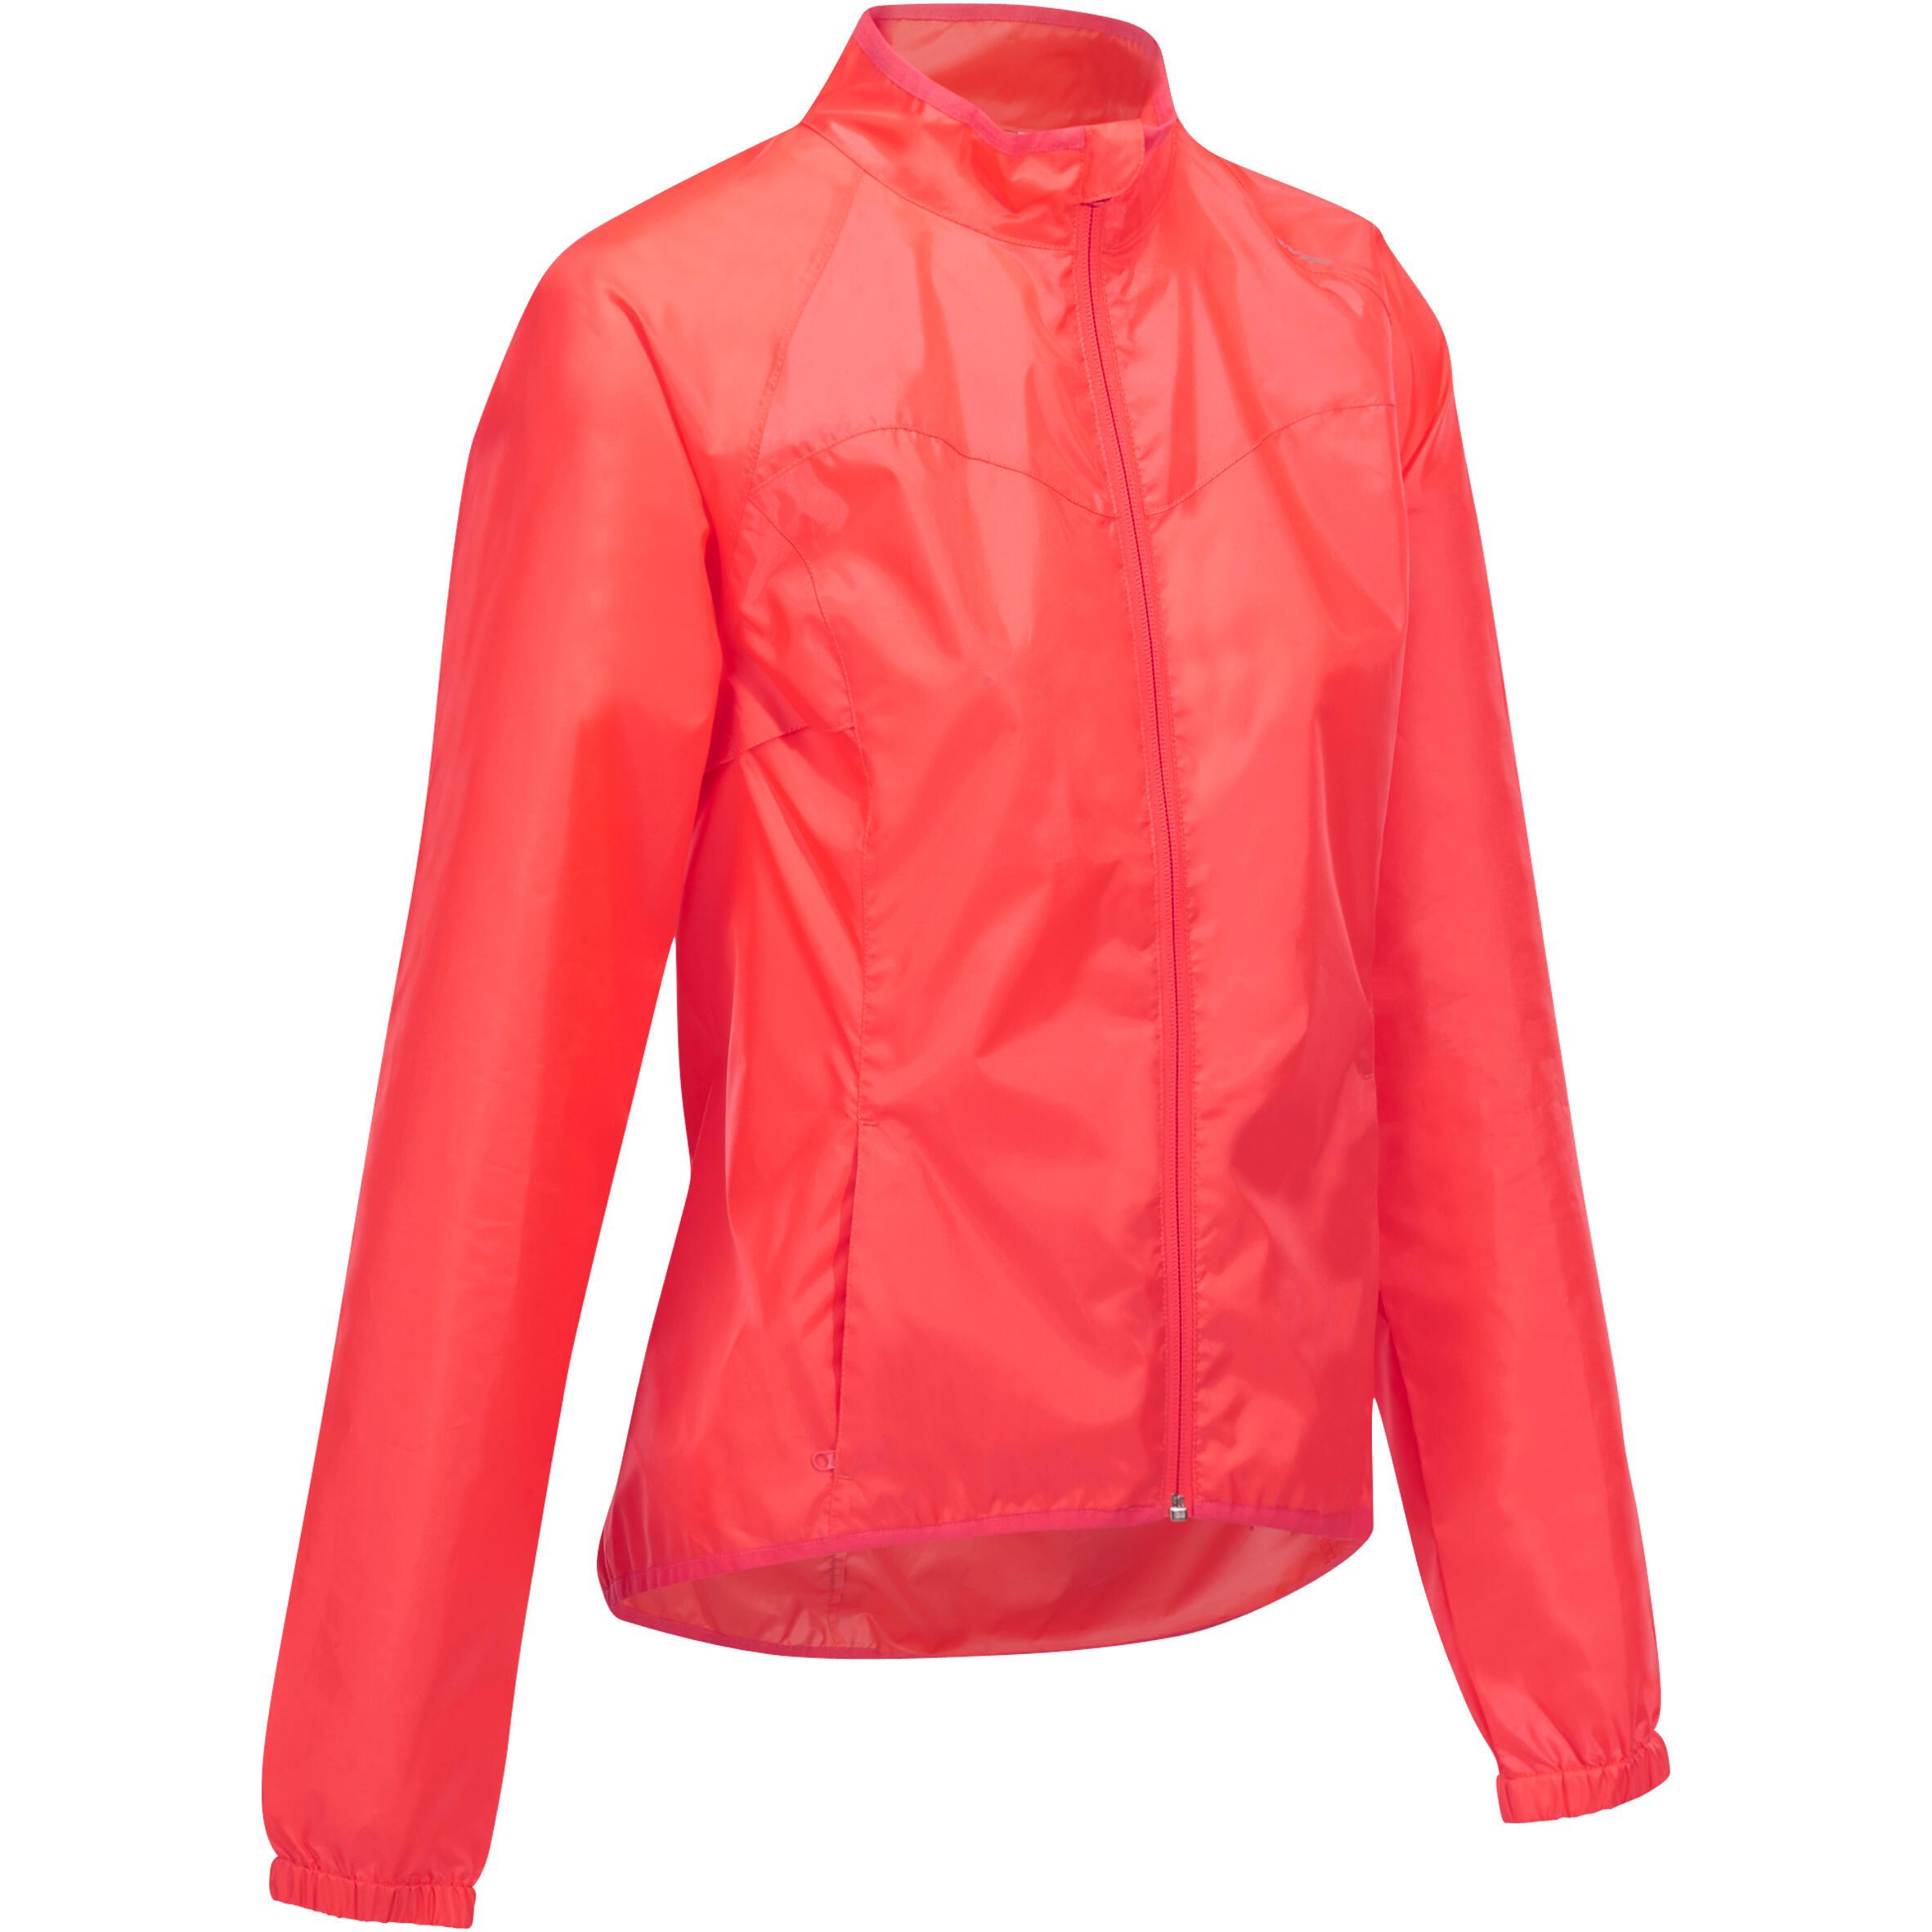 regenbekleidung fahrrad damen